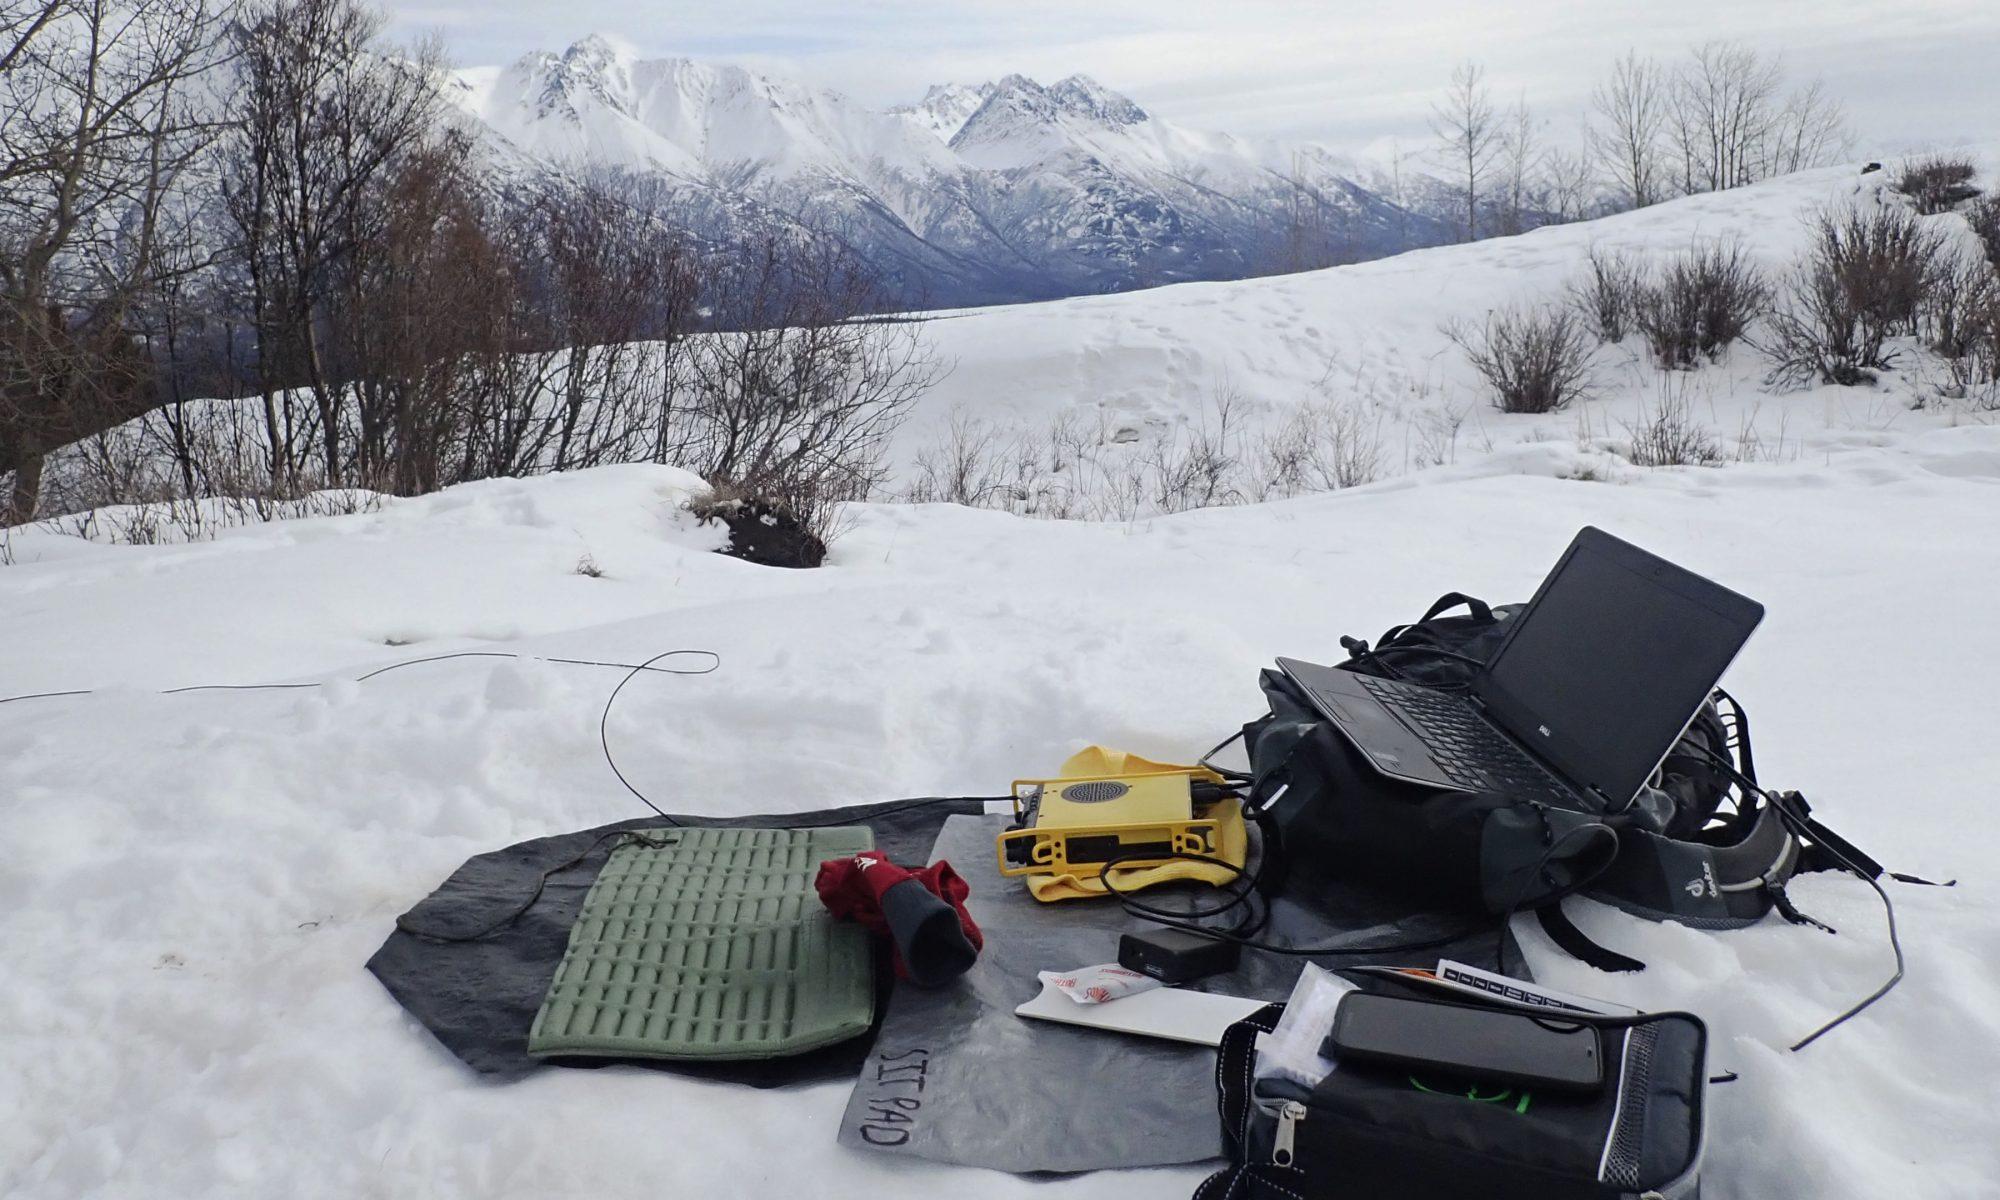 SOTA amateur radio in the snow